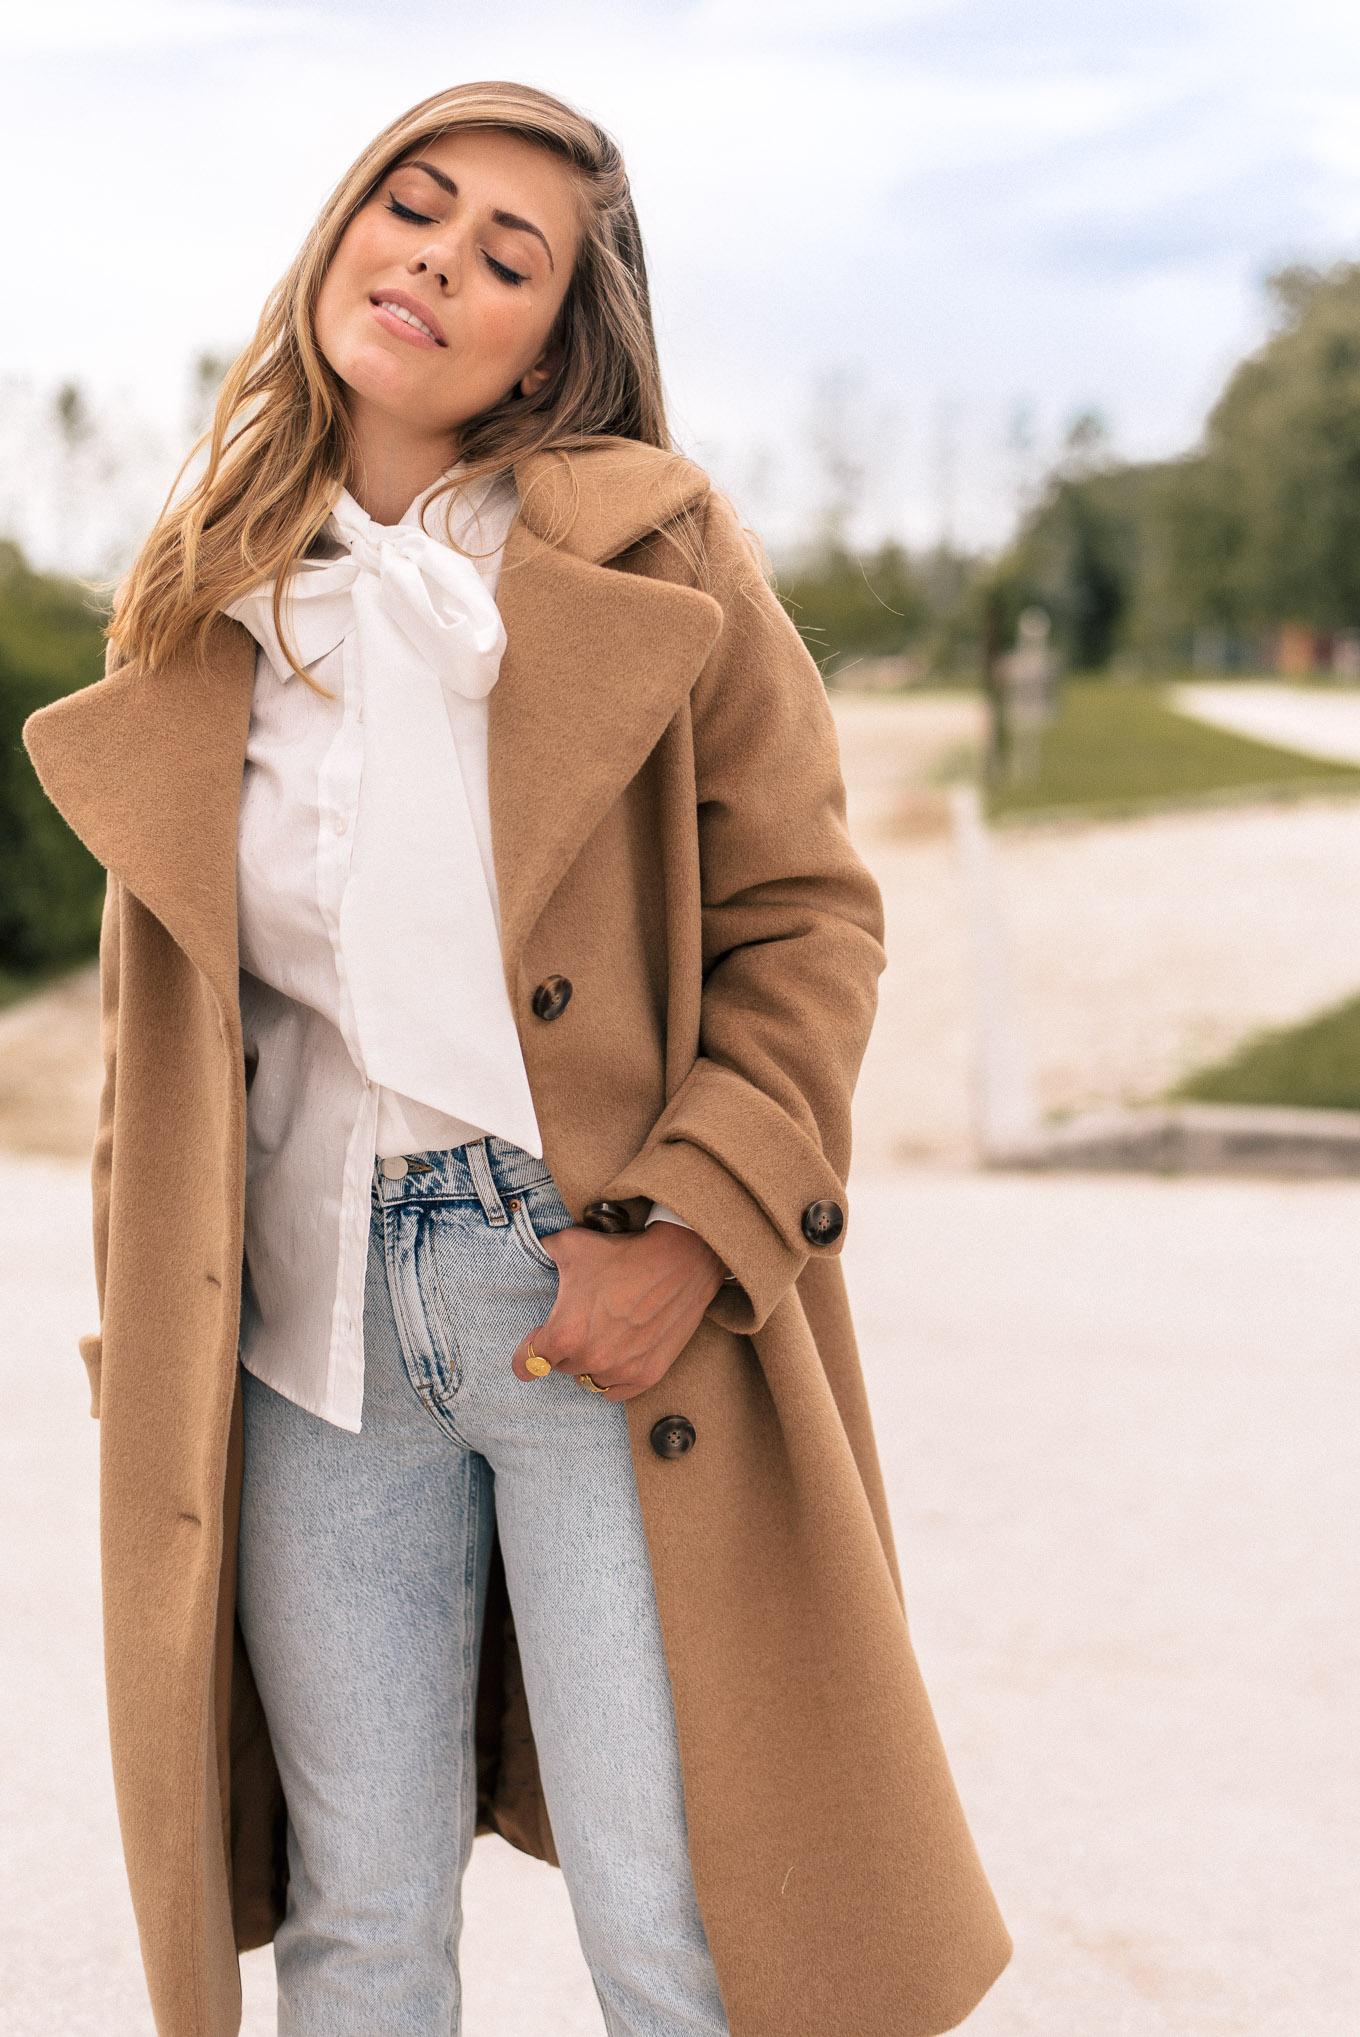 wearing wool cashmere coat